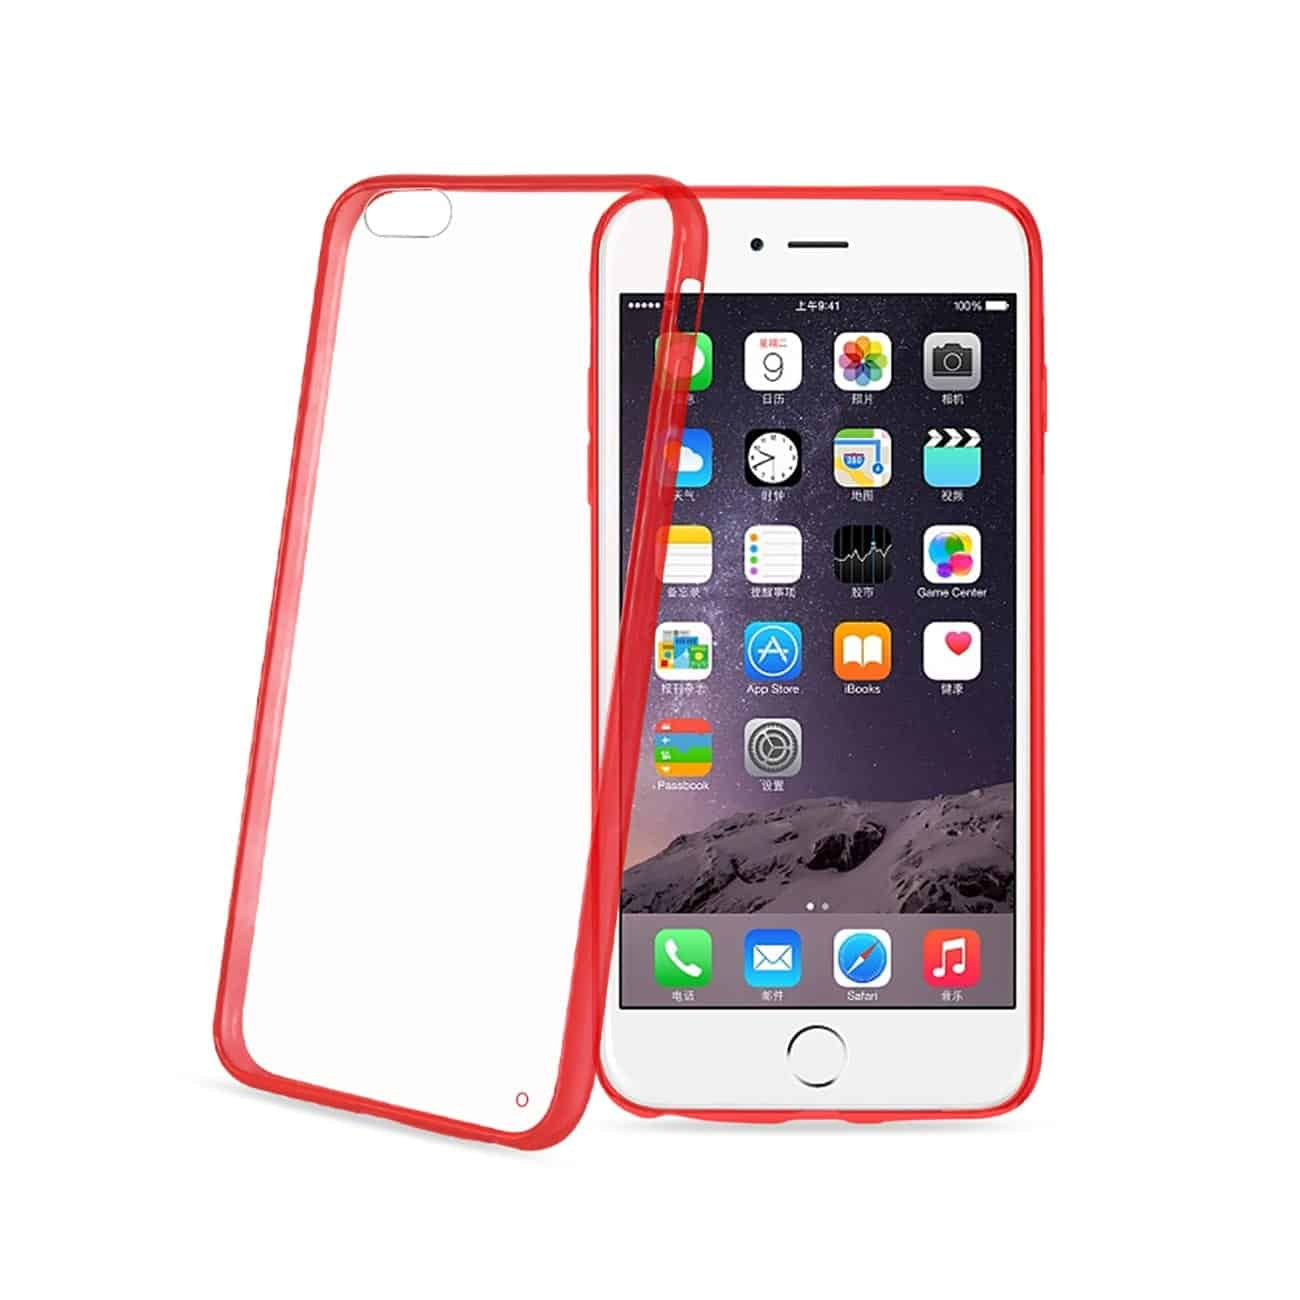 IPHONE 6 PLUS CLEAR BACK FRAME BUMPER CASE IN RED